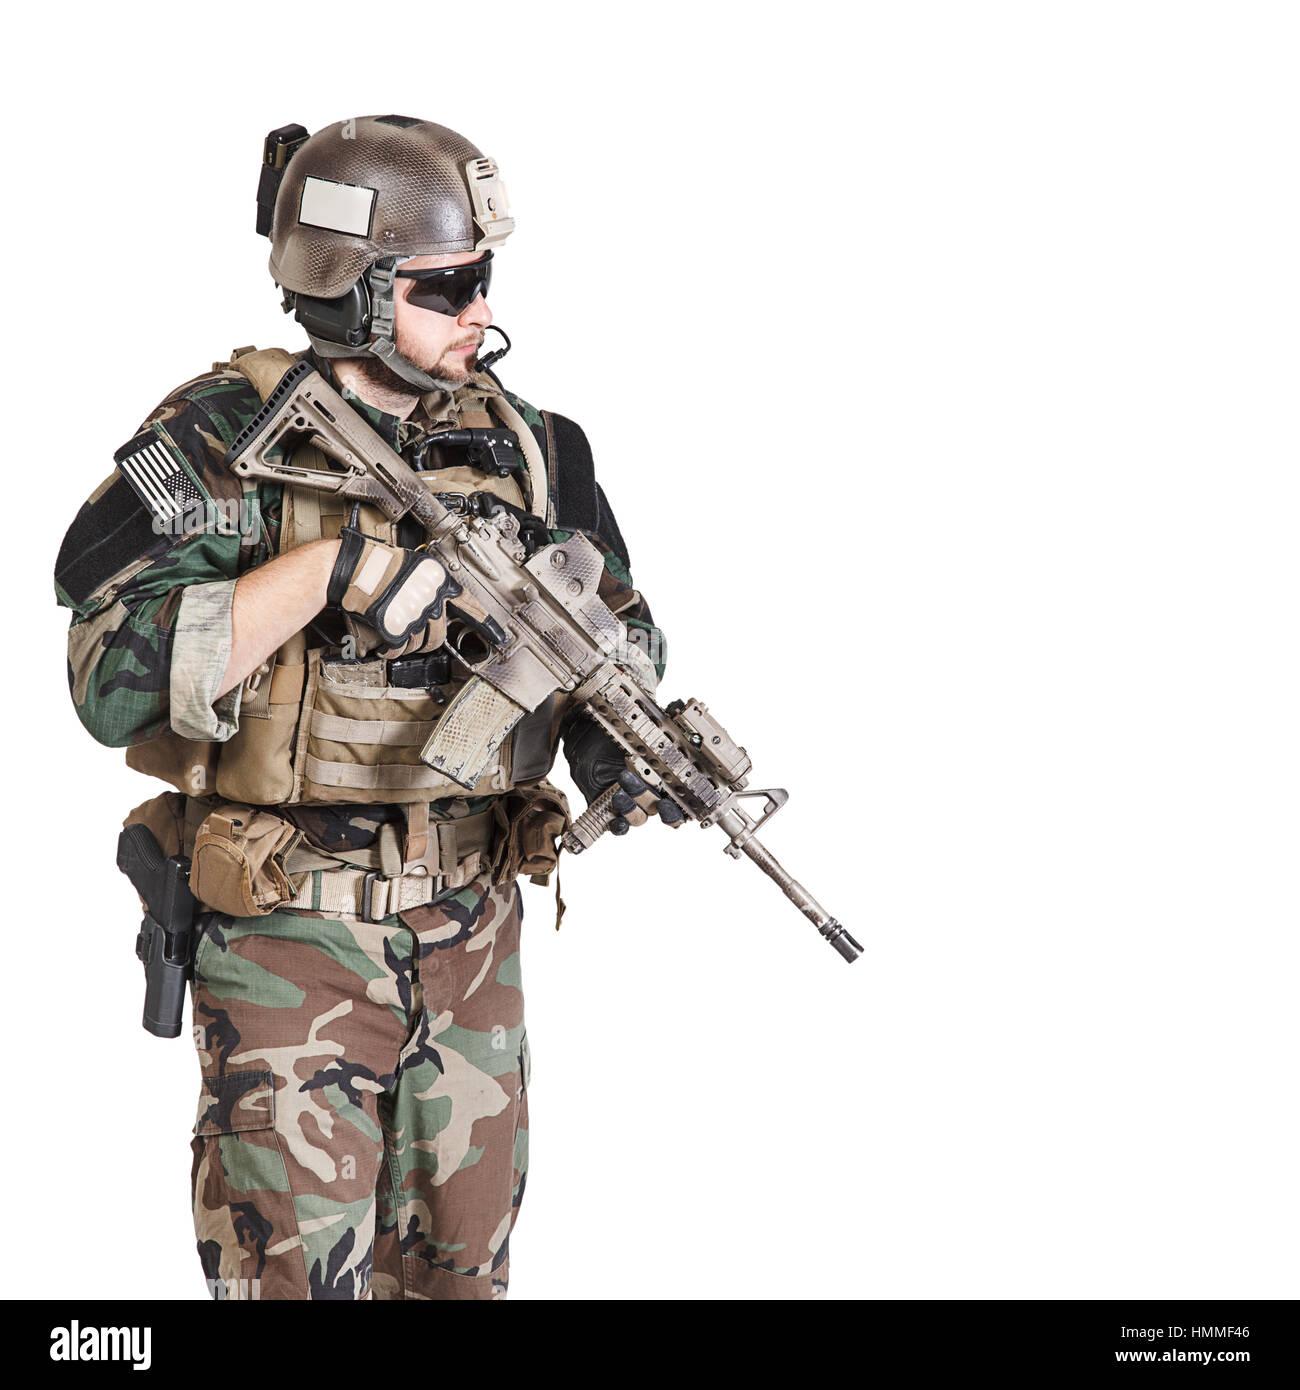 Marine Special Operator - Stock Image